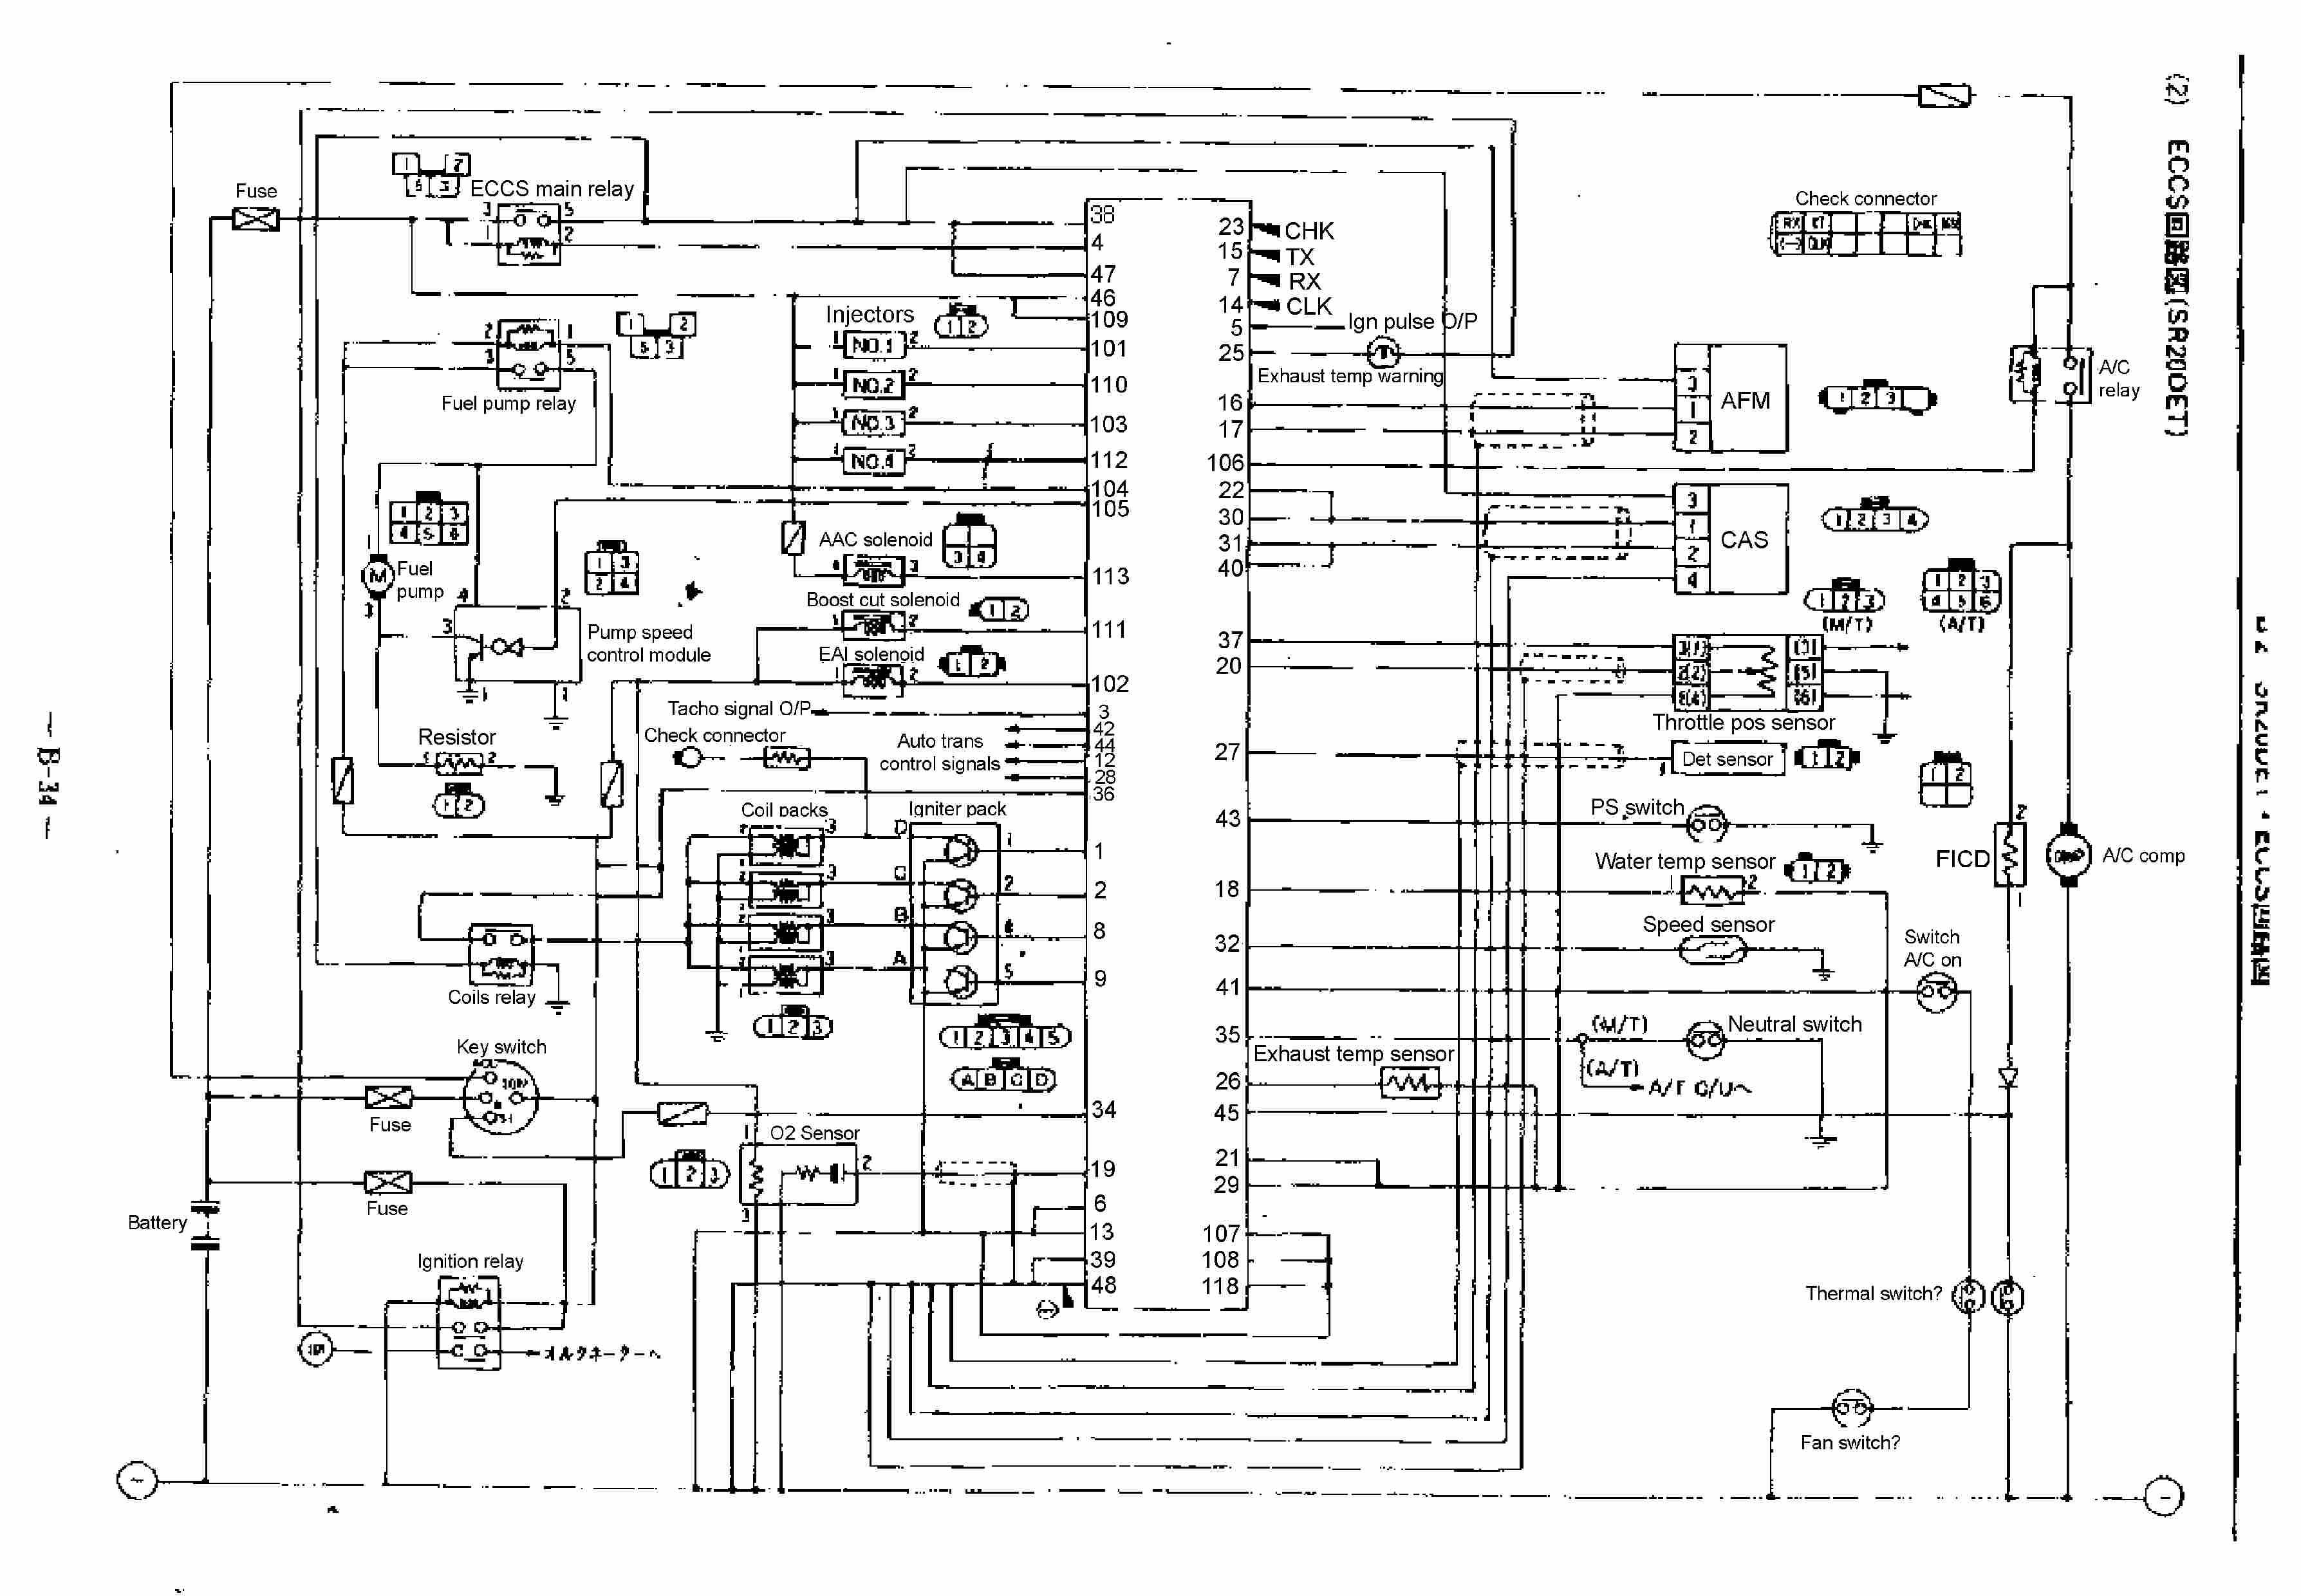 nissan cabstar wiring diagram wiring diagram 2001 toyota camry wiring schematic 1990 toyota camry wiring diagram [ 3575 x 2480 Pixel ]